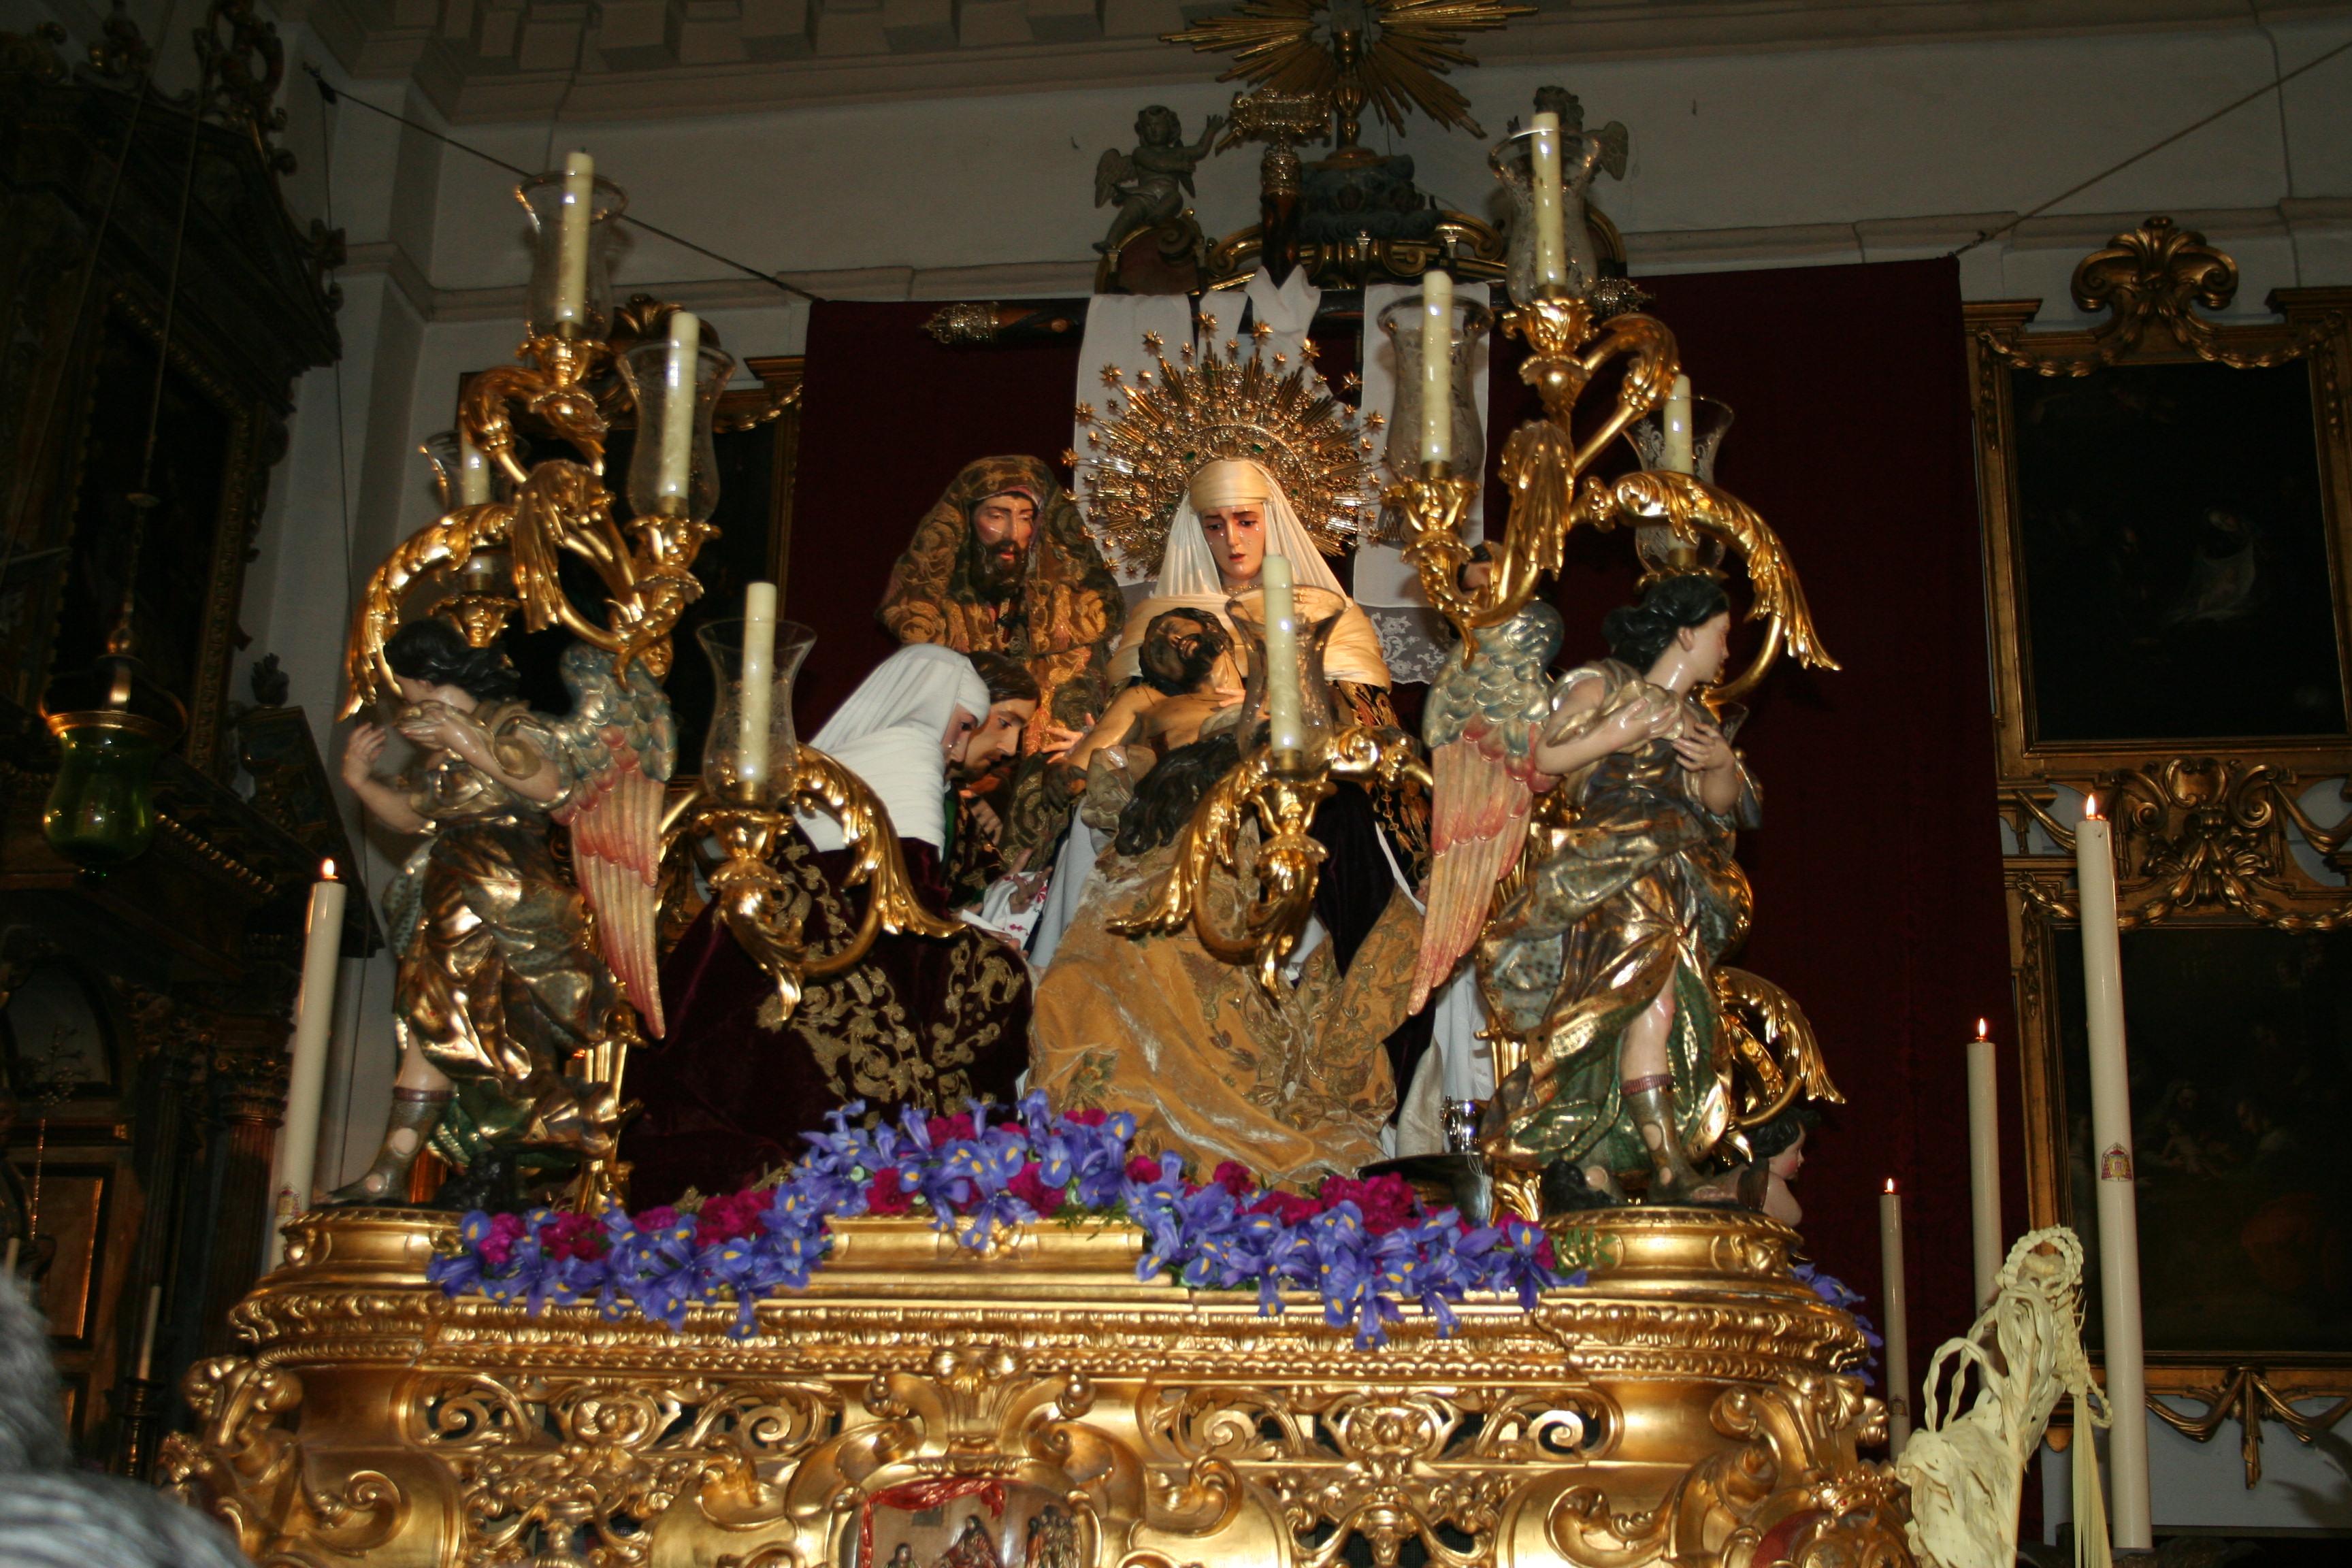 Hermandad de la Sagrada Mortaja de Sevilla, 2012